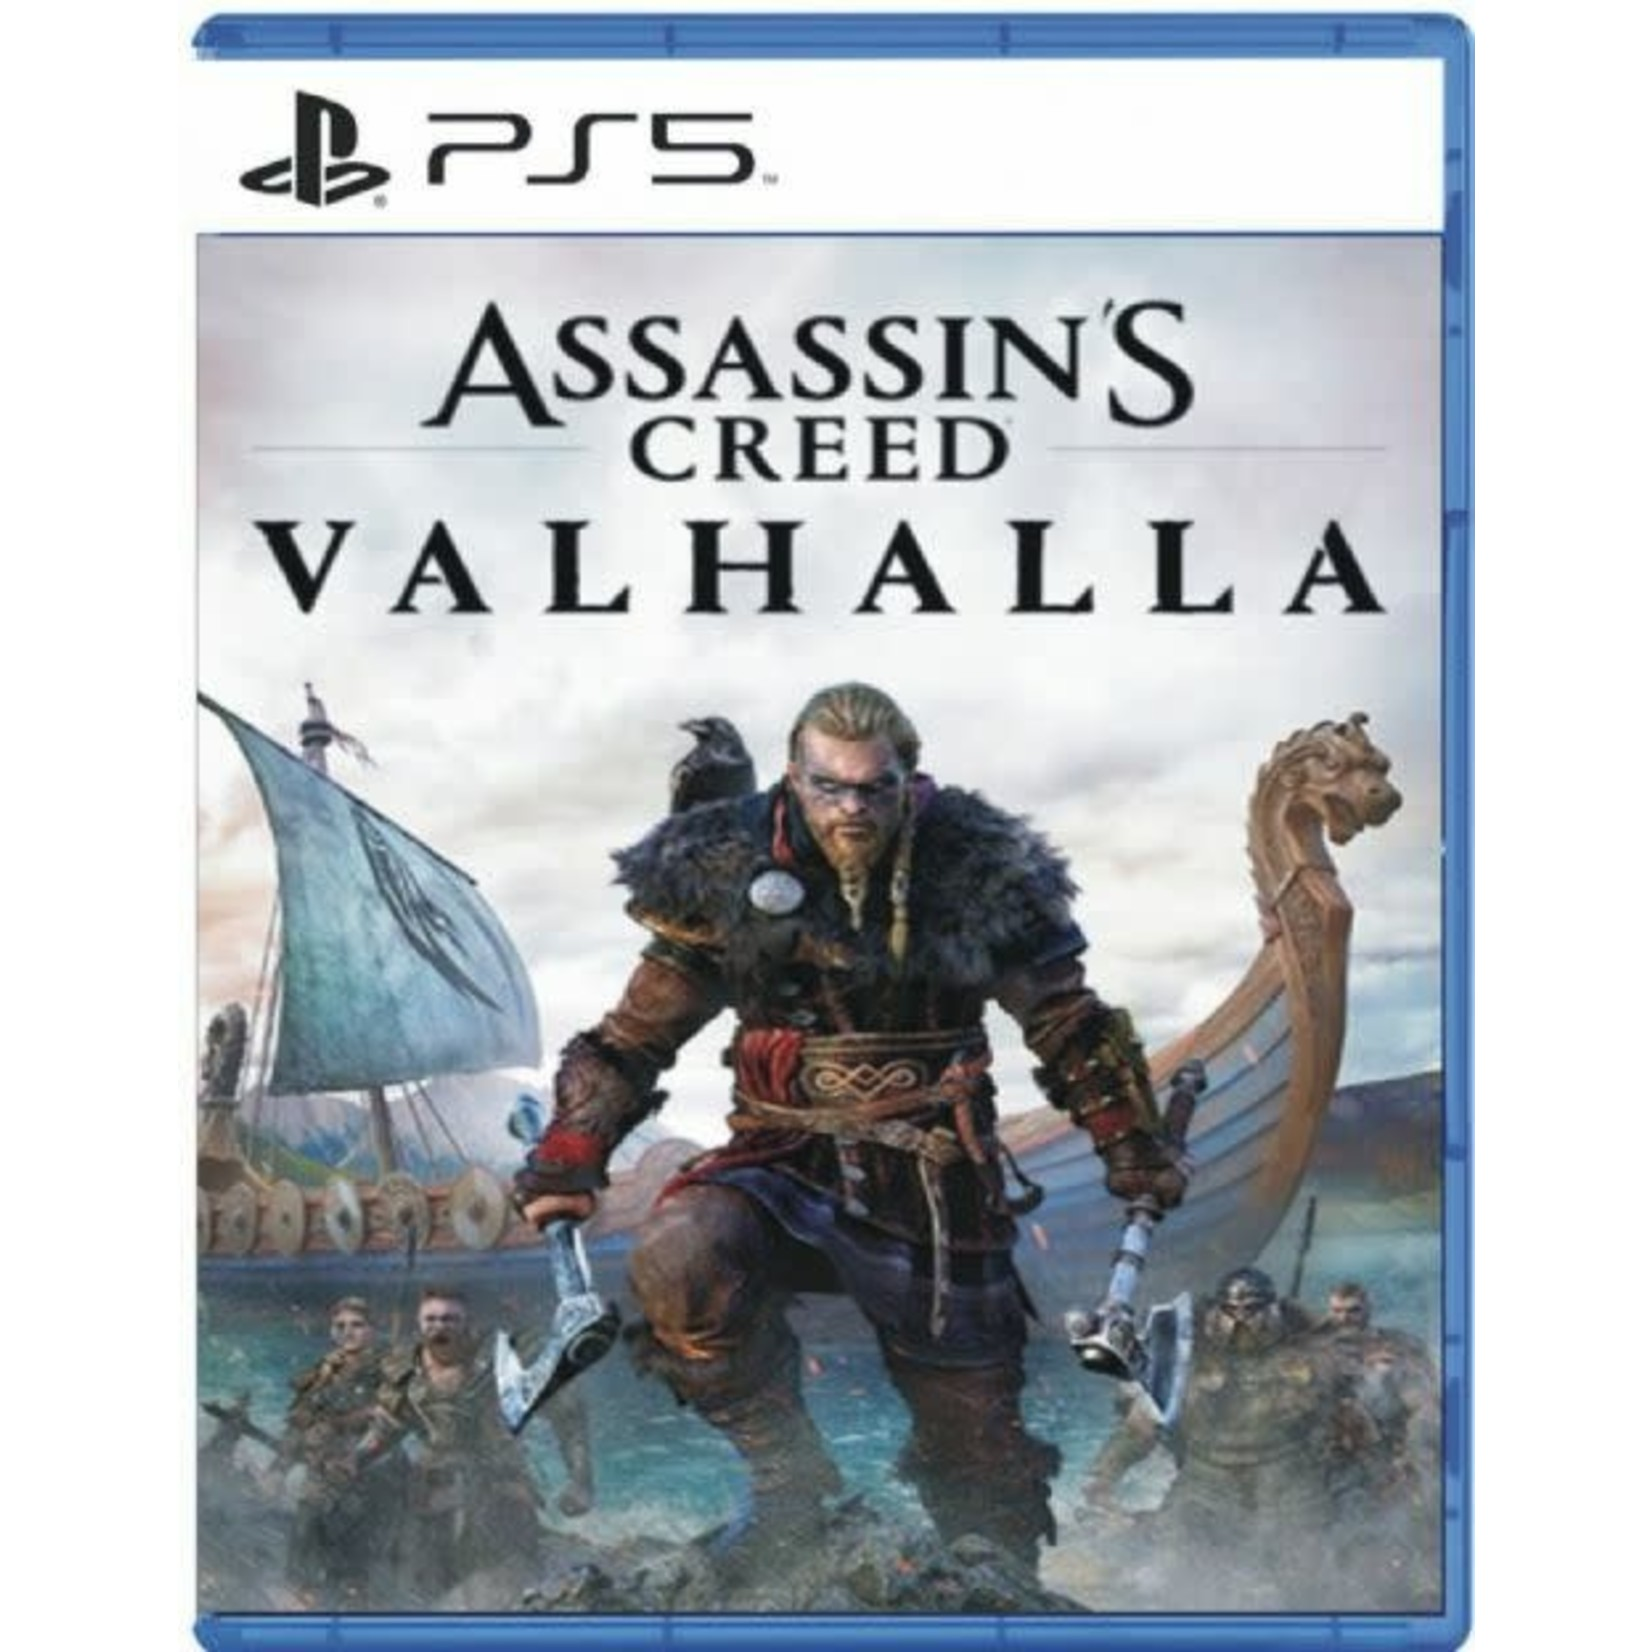 PS5-Assassin's Creed Valhalla